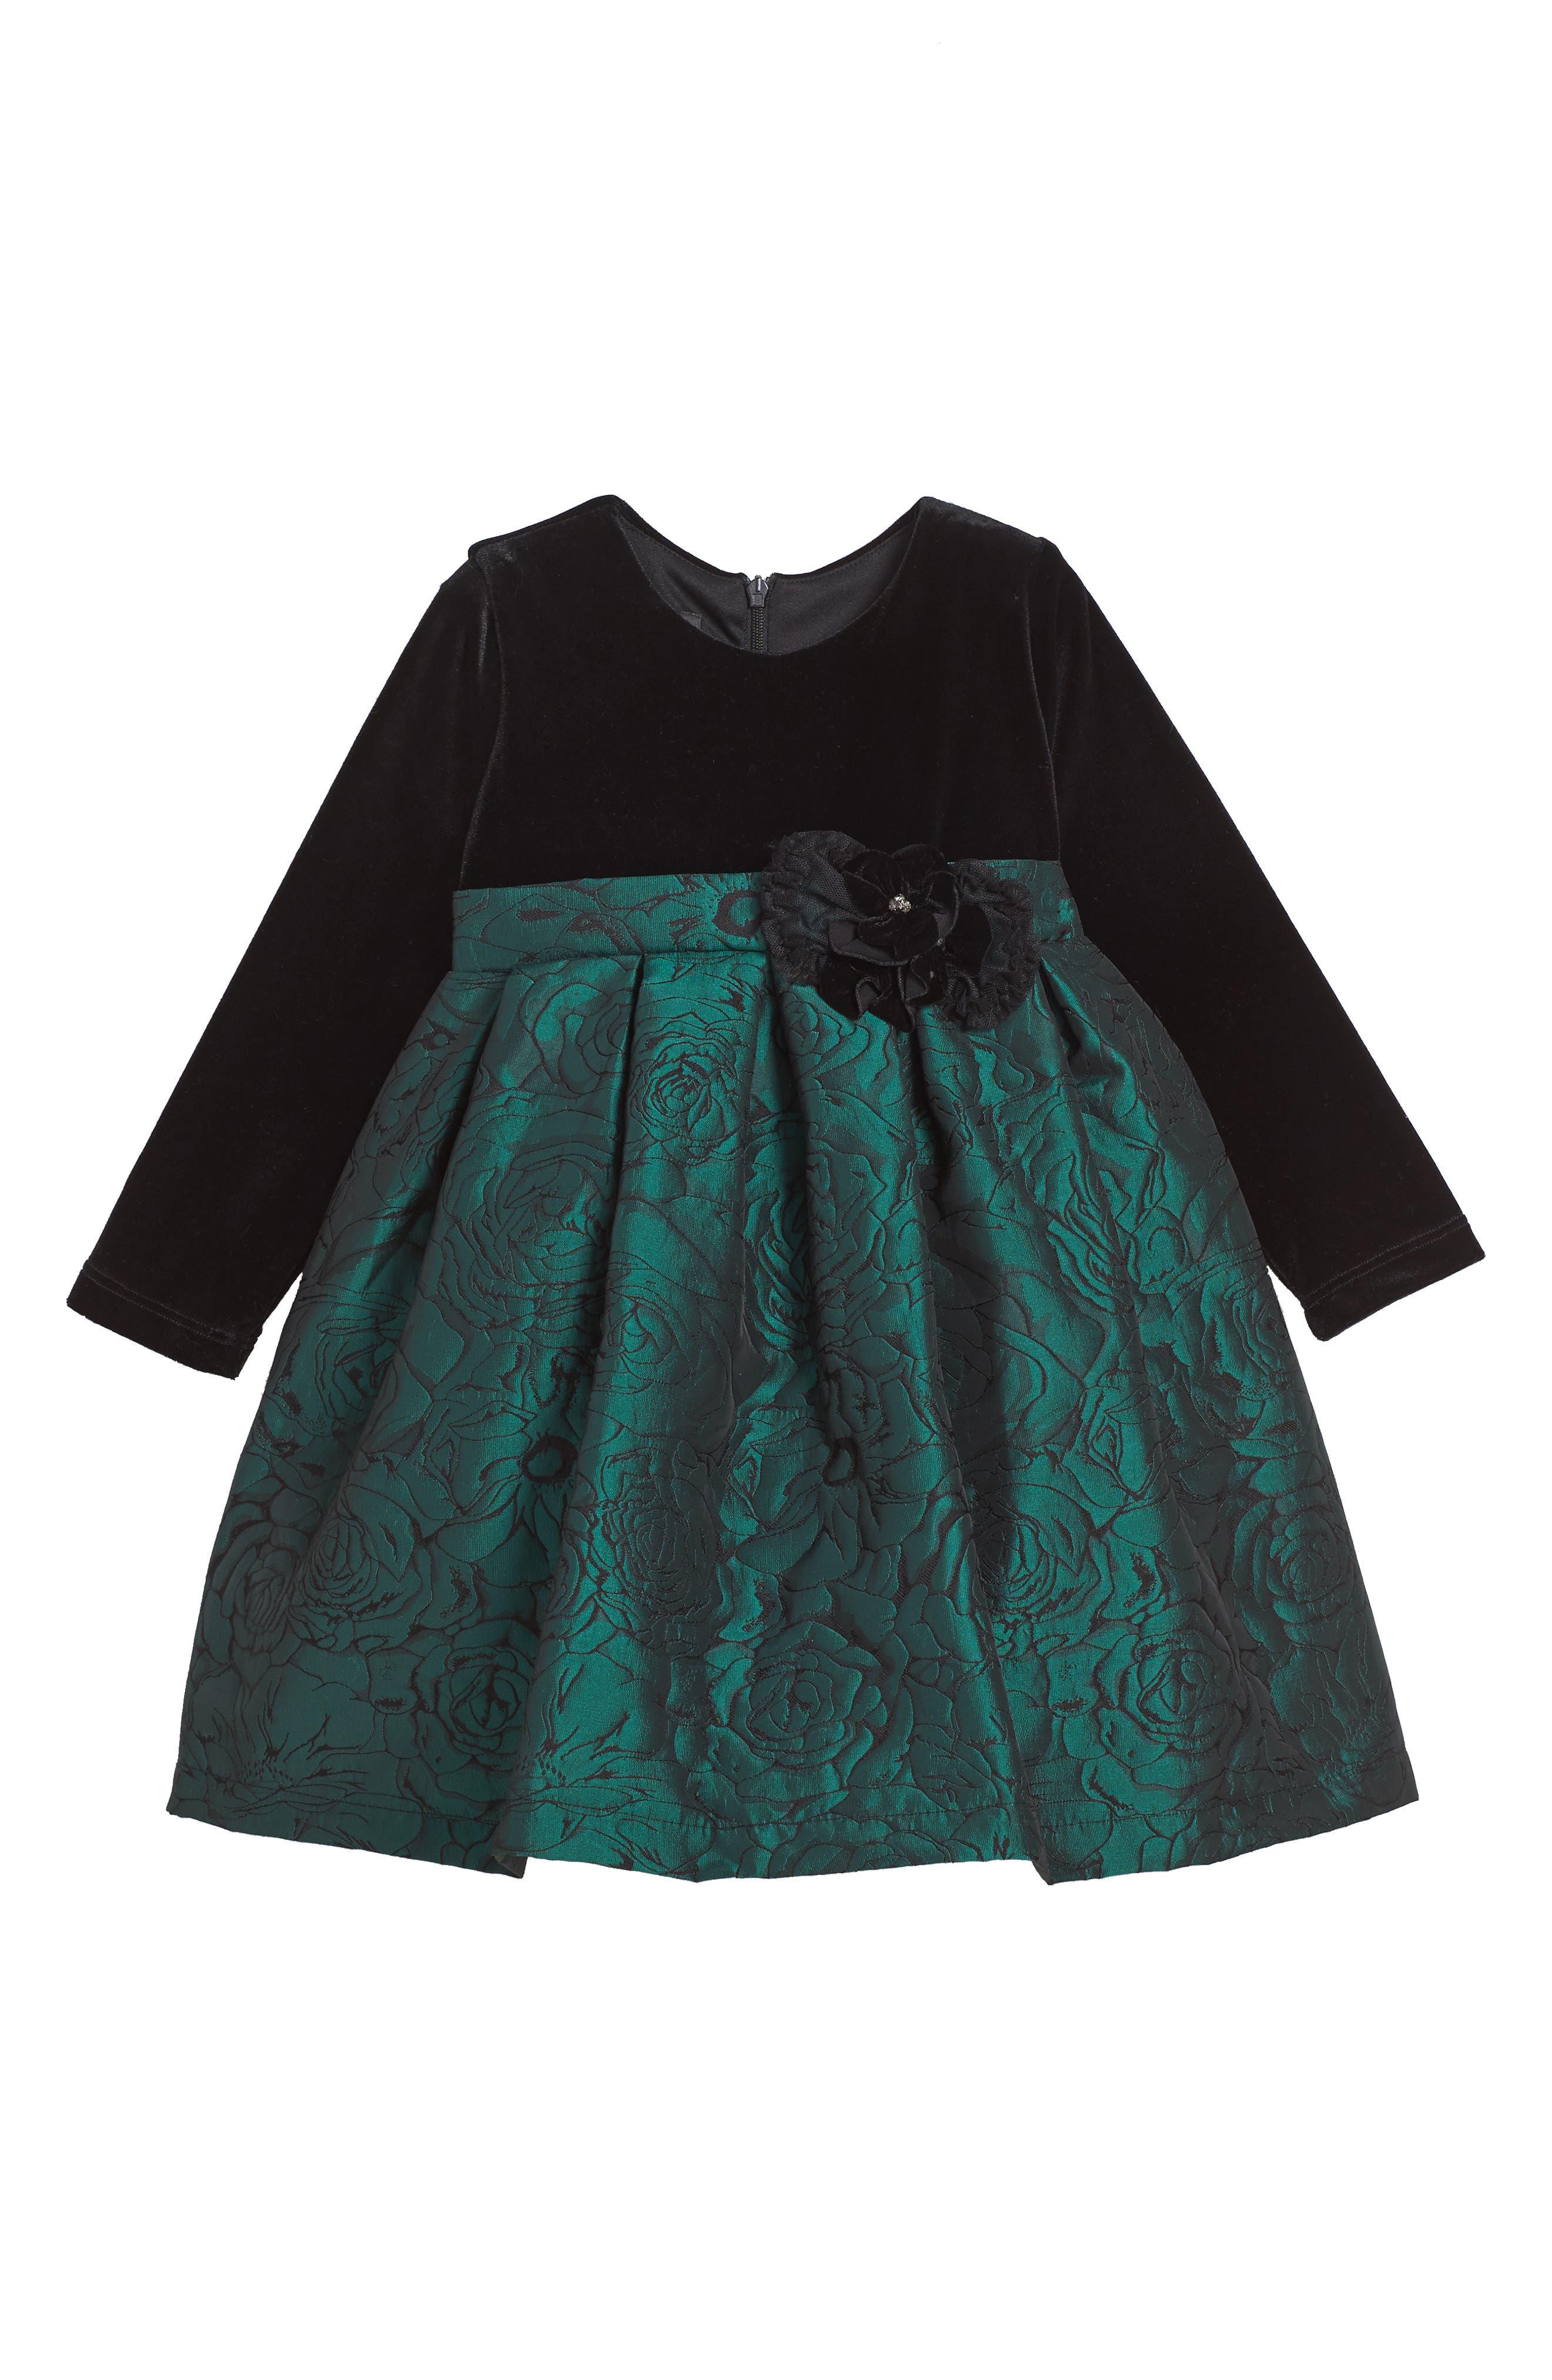 Mistletoe Dress,                             Main thumbnail 1, color,                             300